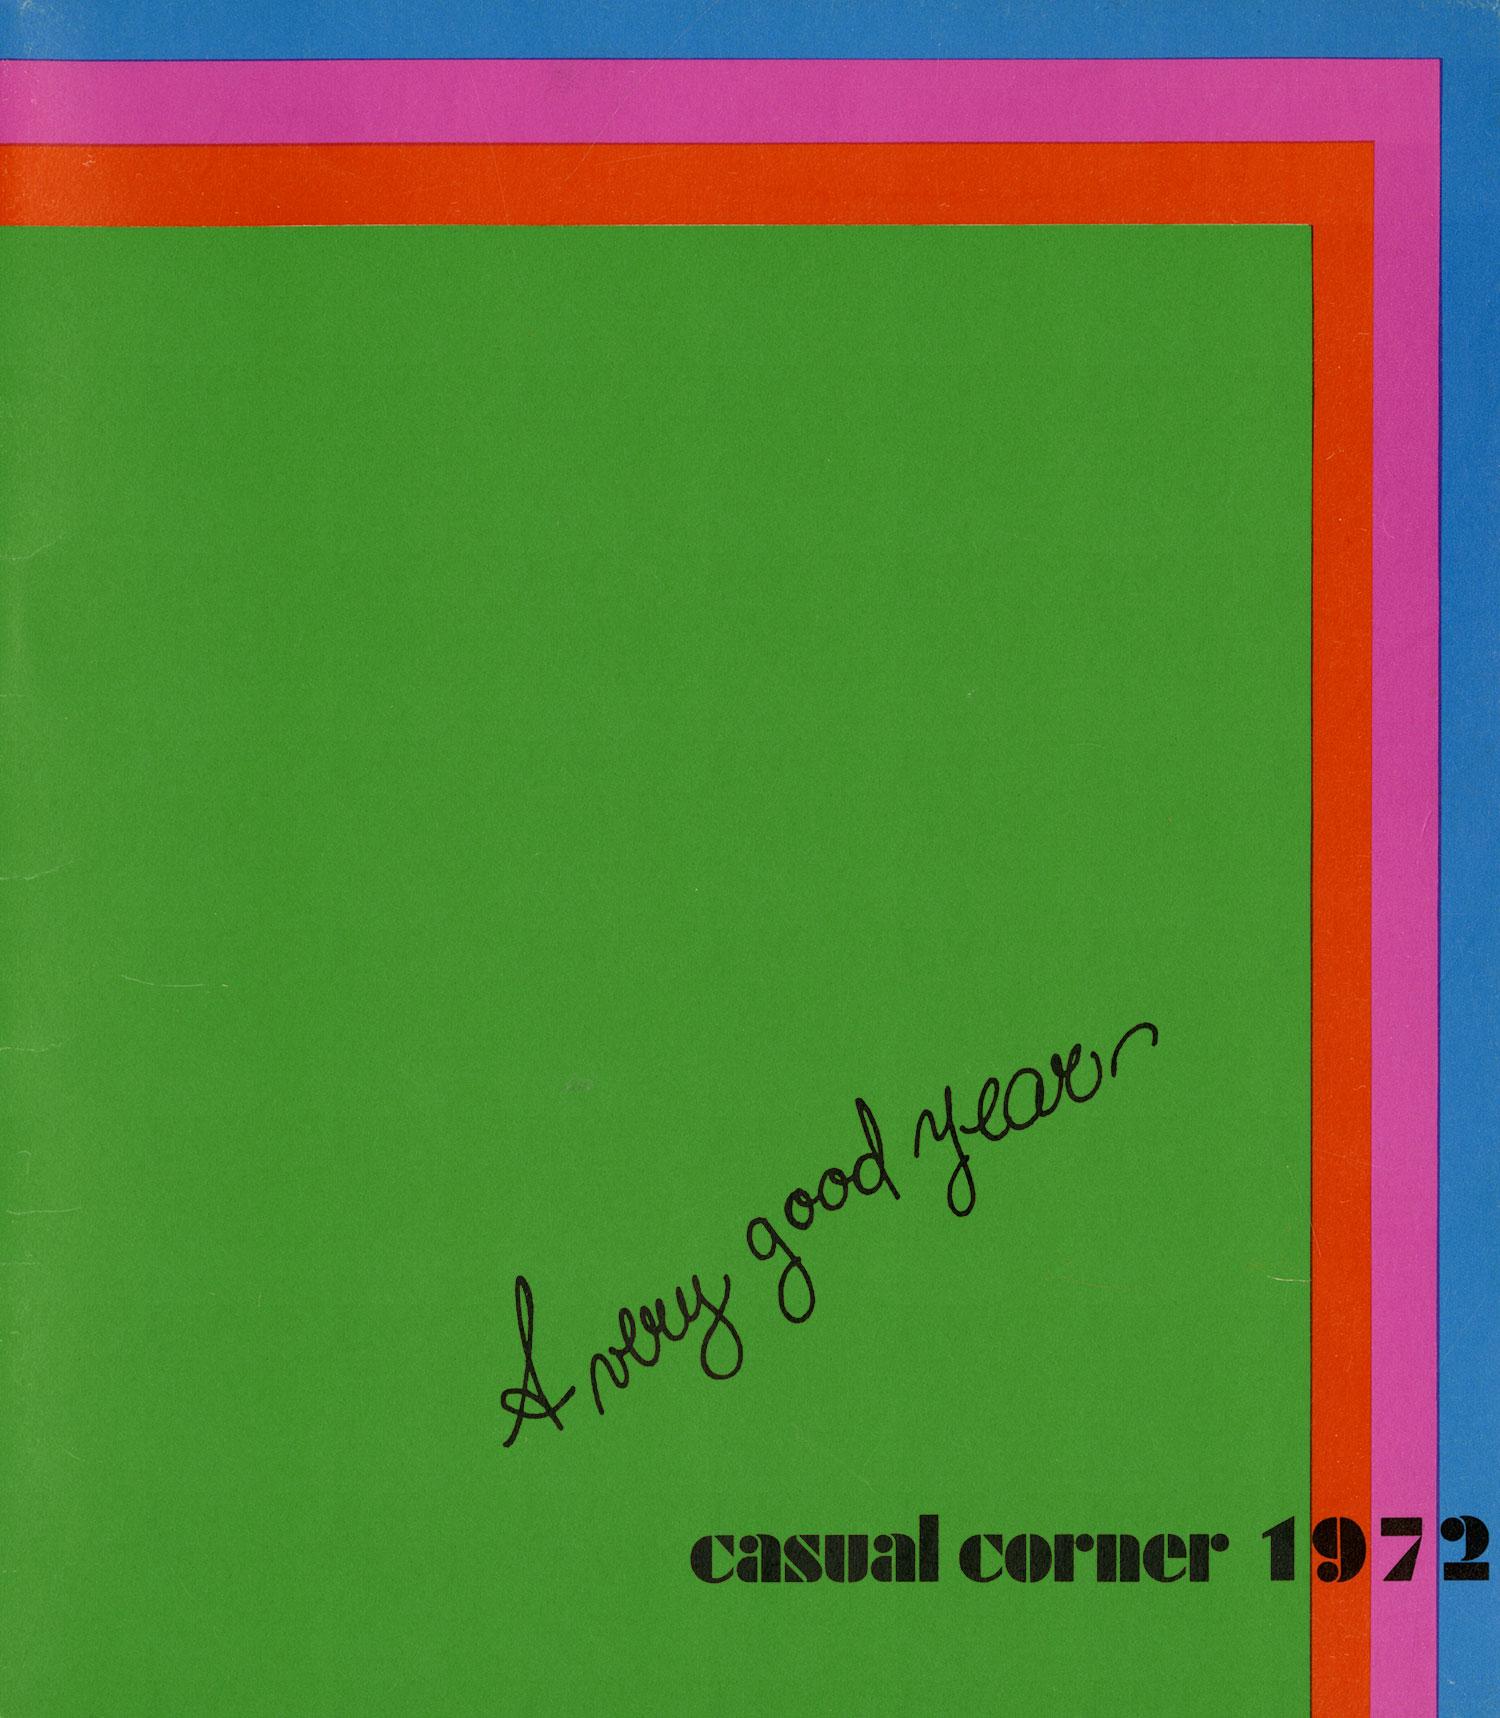 CASUAL CORNER CALENDAR